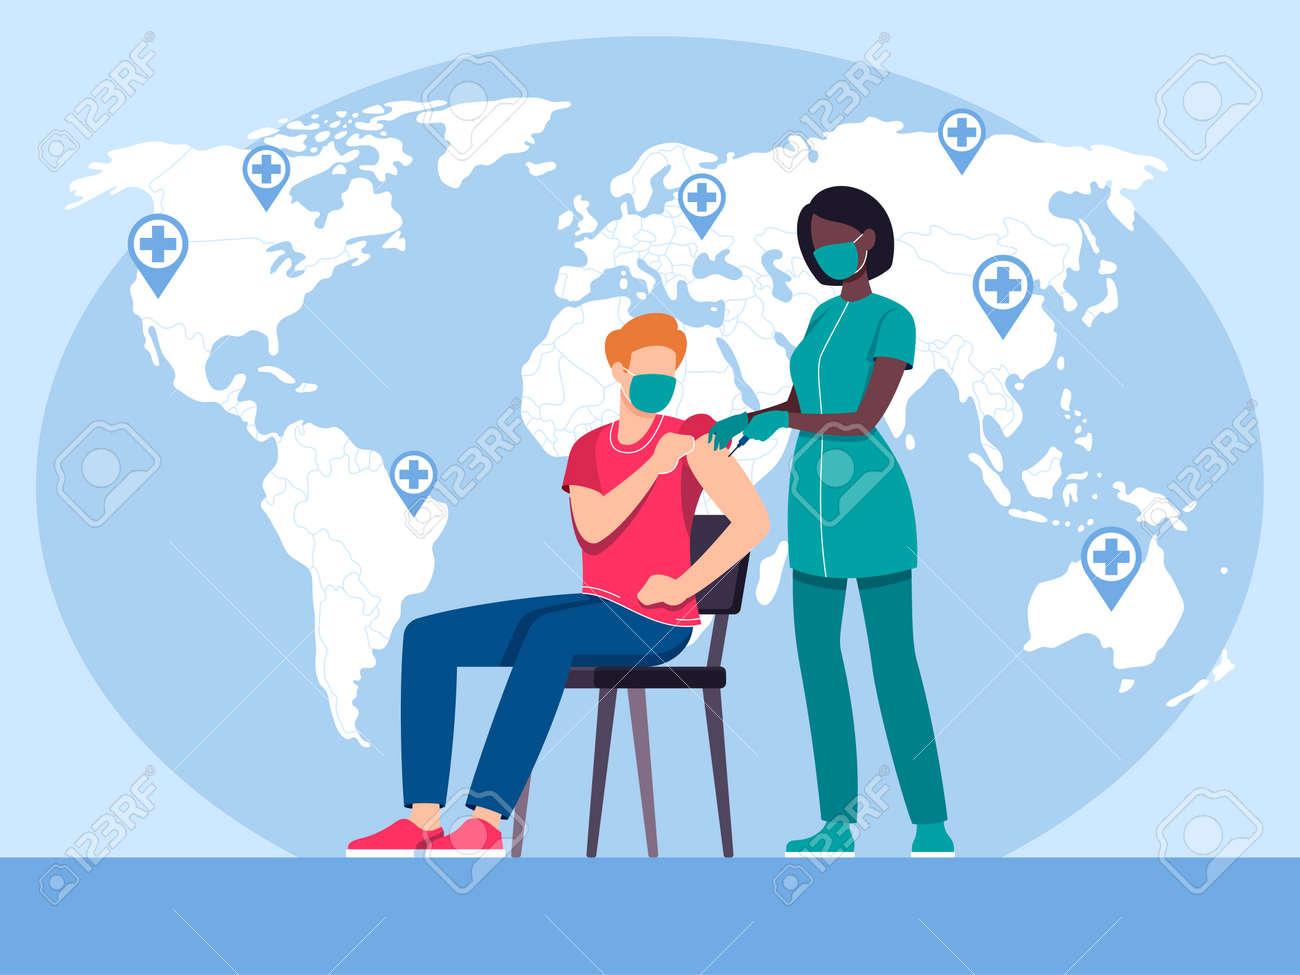 virus vaccination illustration in flat vector - 168742726